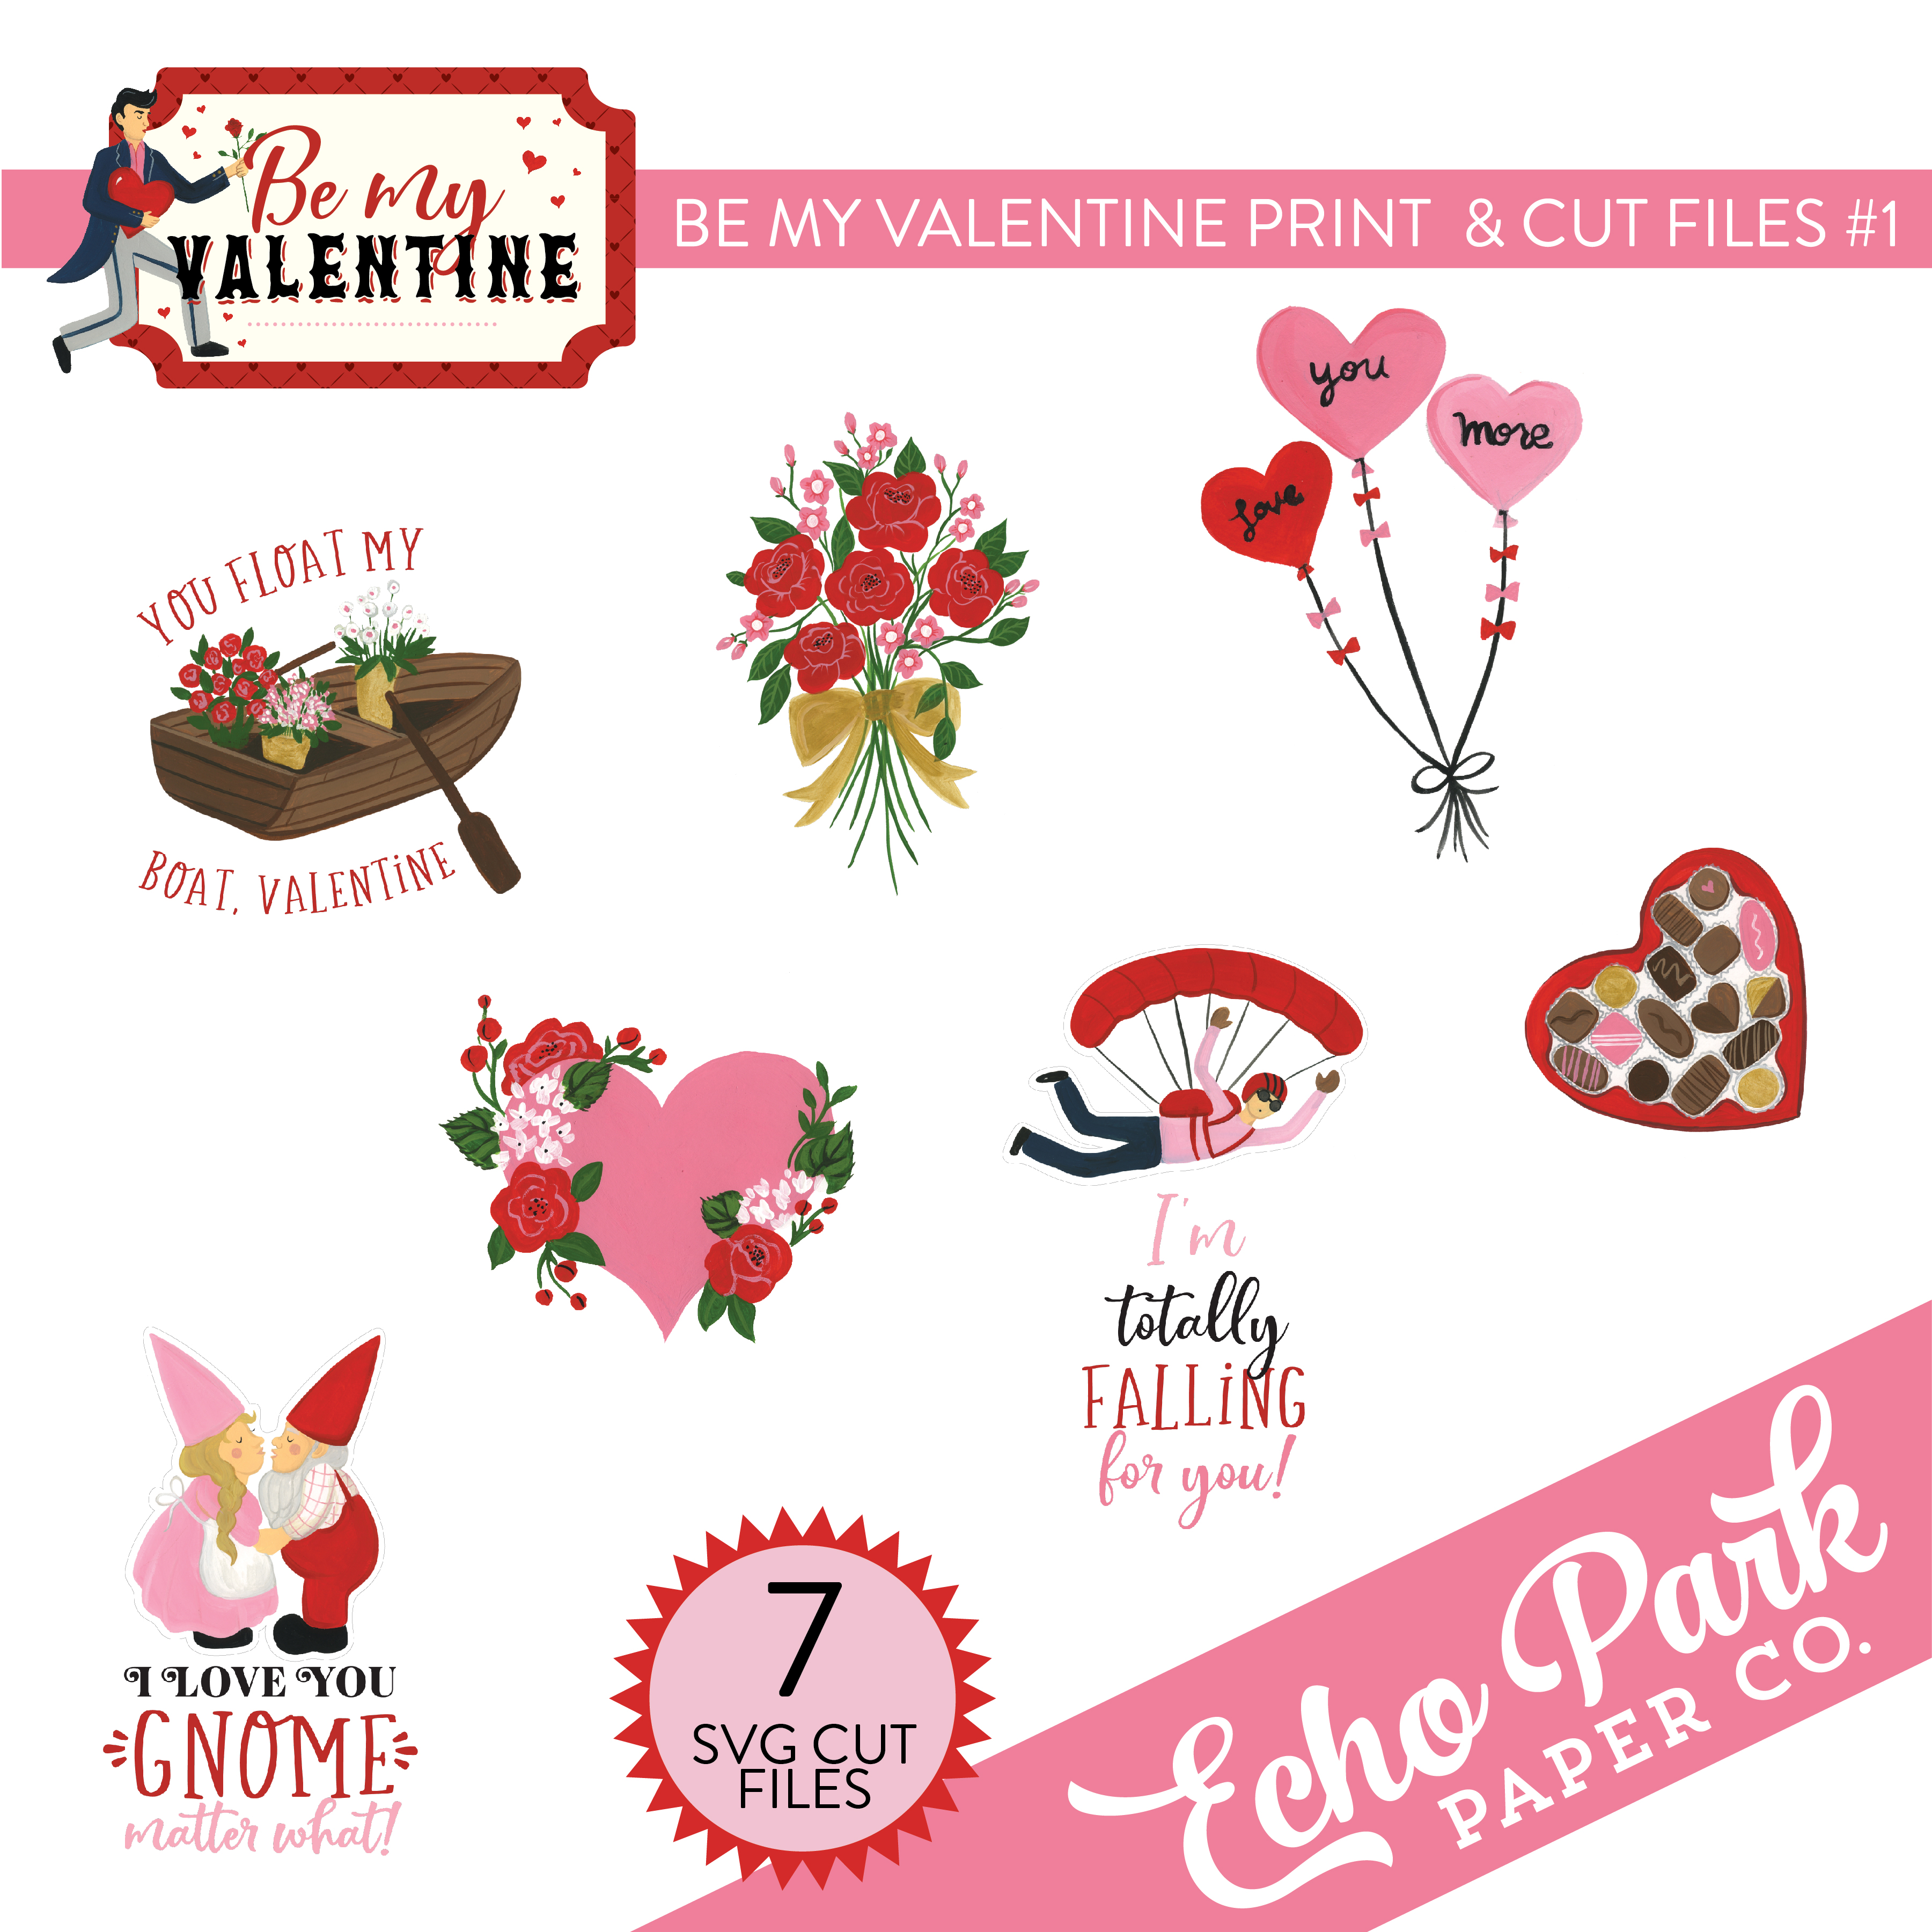 Be My Valentine Print & Cut Files #1